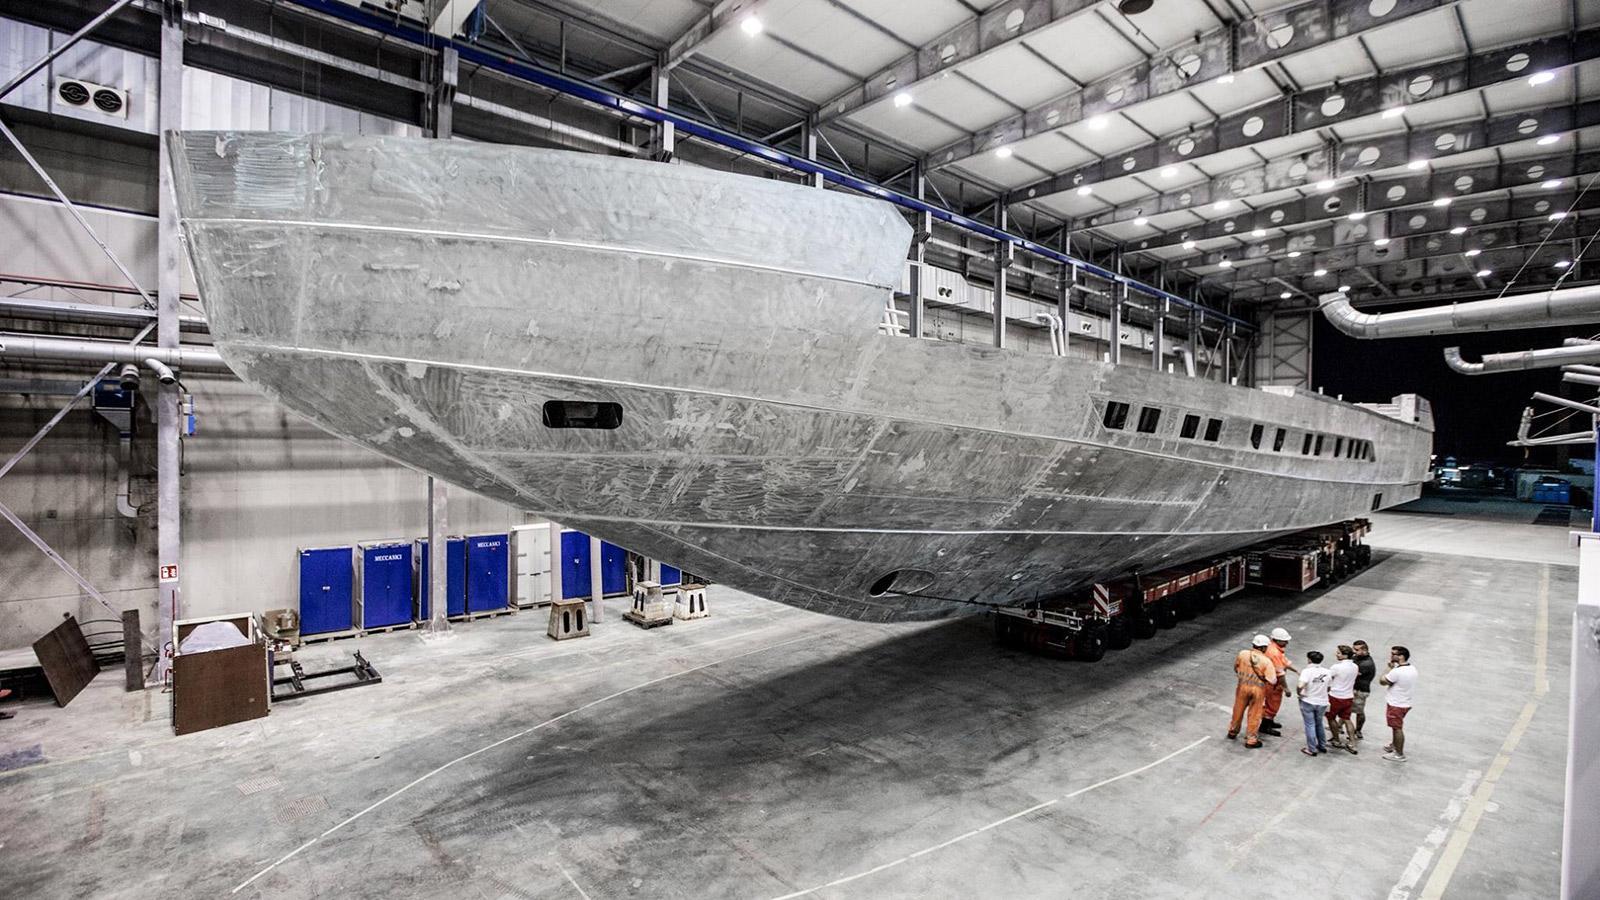 pershing 140 motoryacht pershing yachts 43m 2018 under construction shed